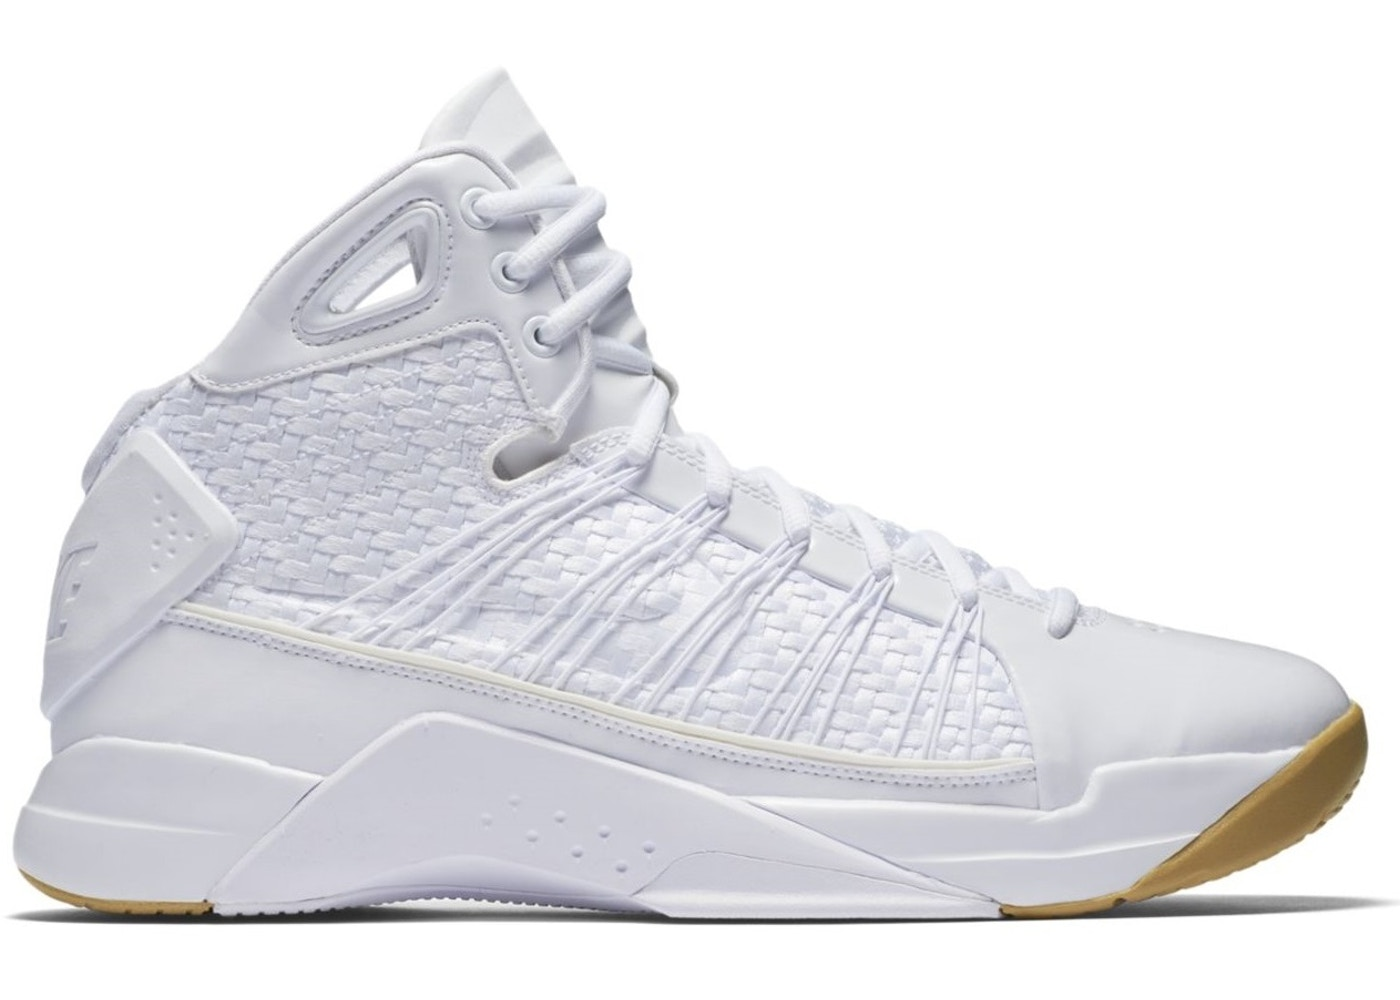 finest selection 2689b e282d Buy Nike Basketball Hyperdunk Shoes  Deadstock Sneakers